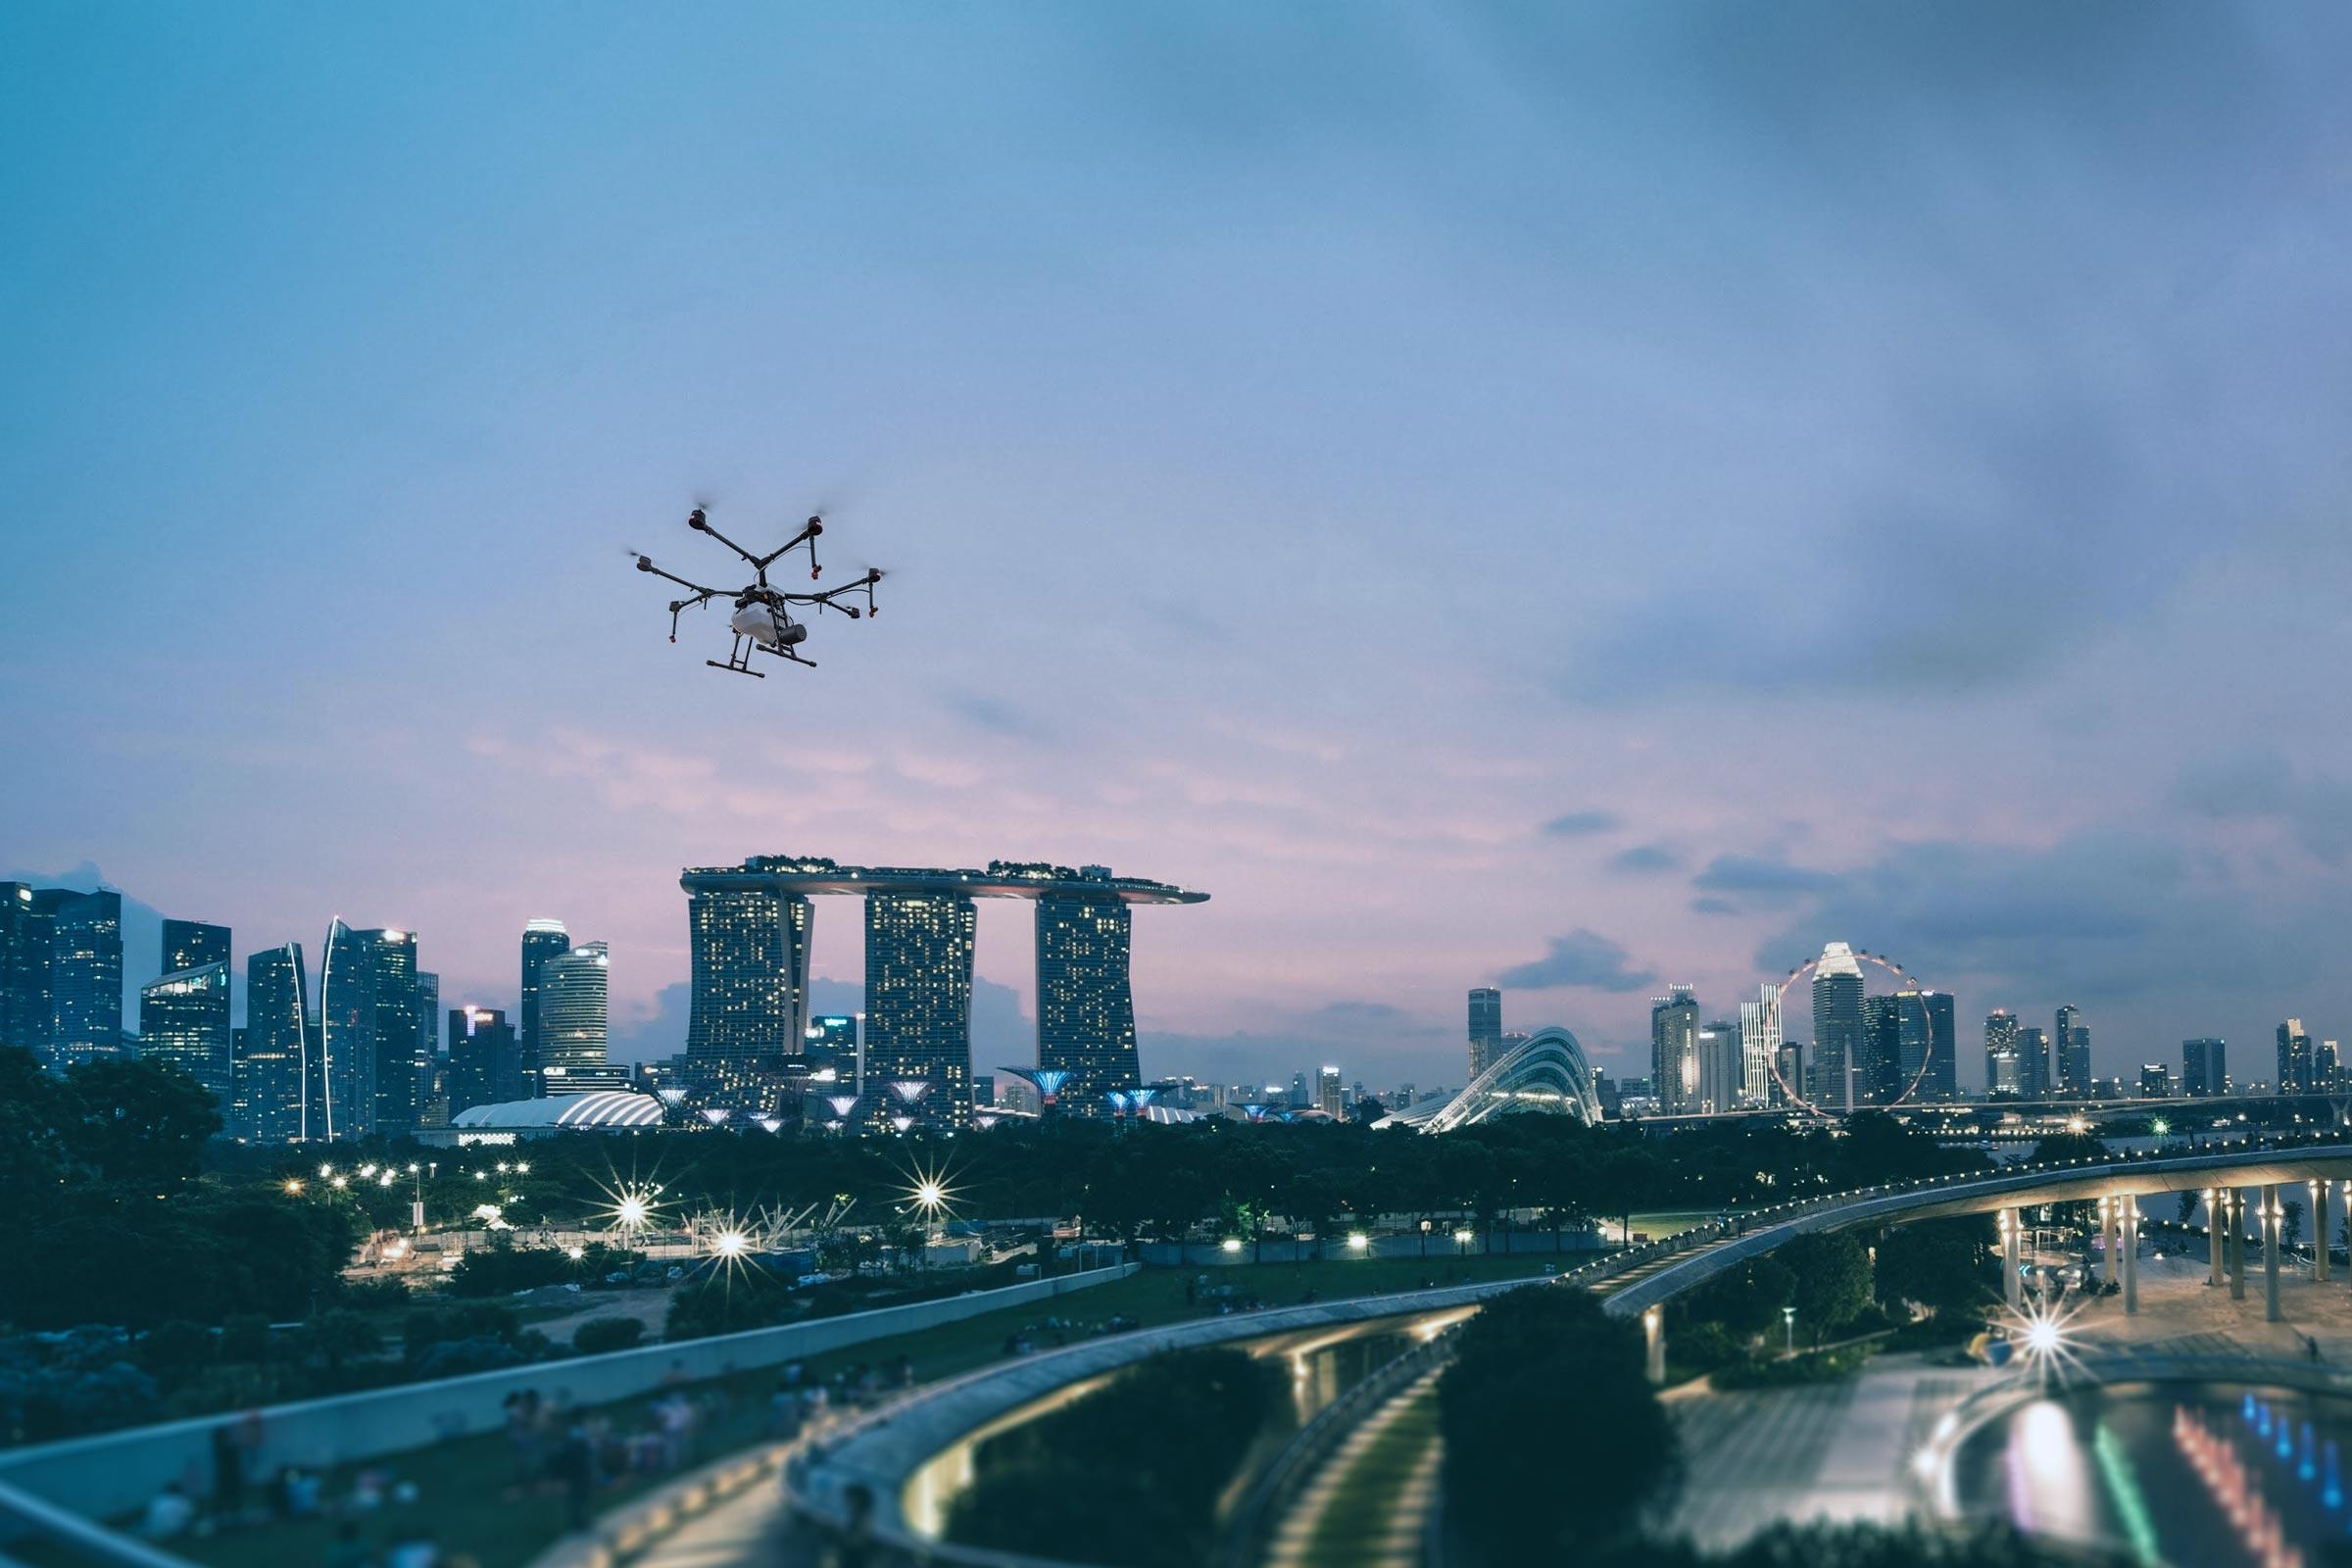 Webinar Airspace Security in an Urban Environment